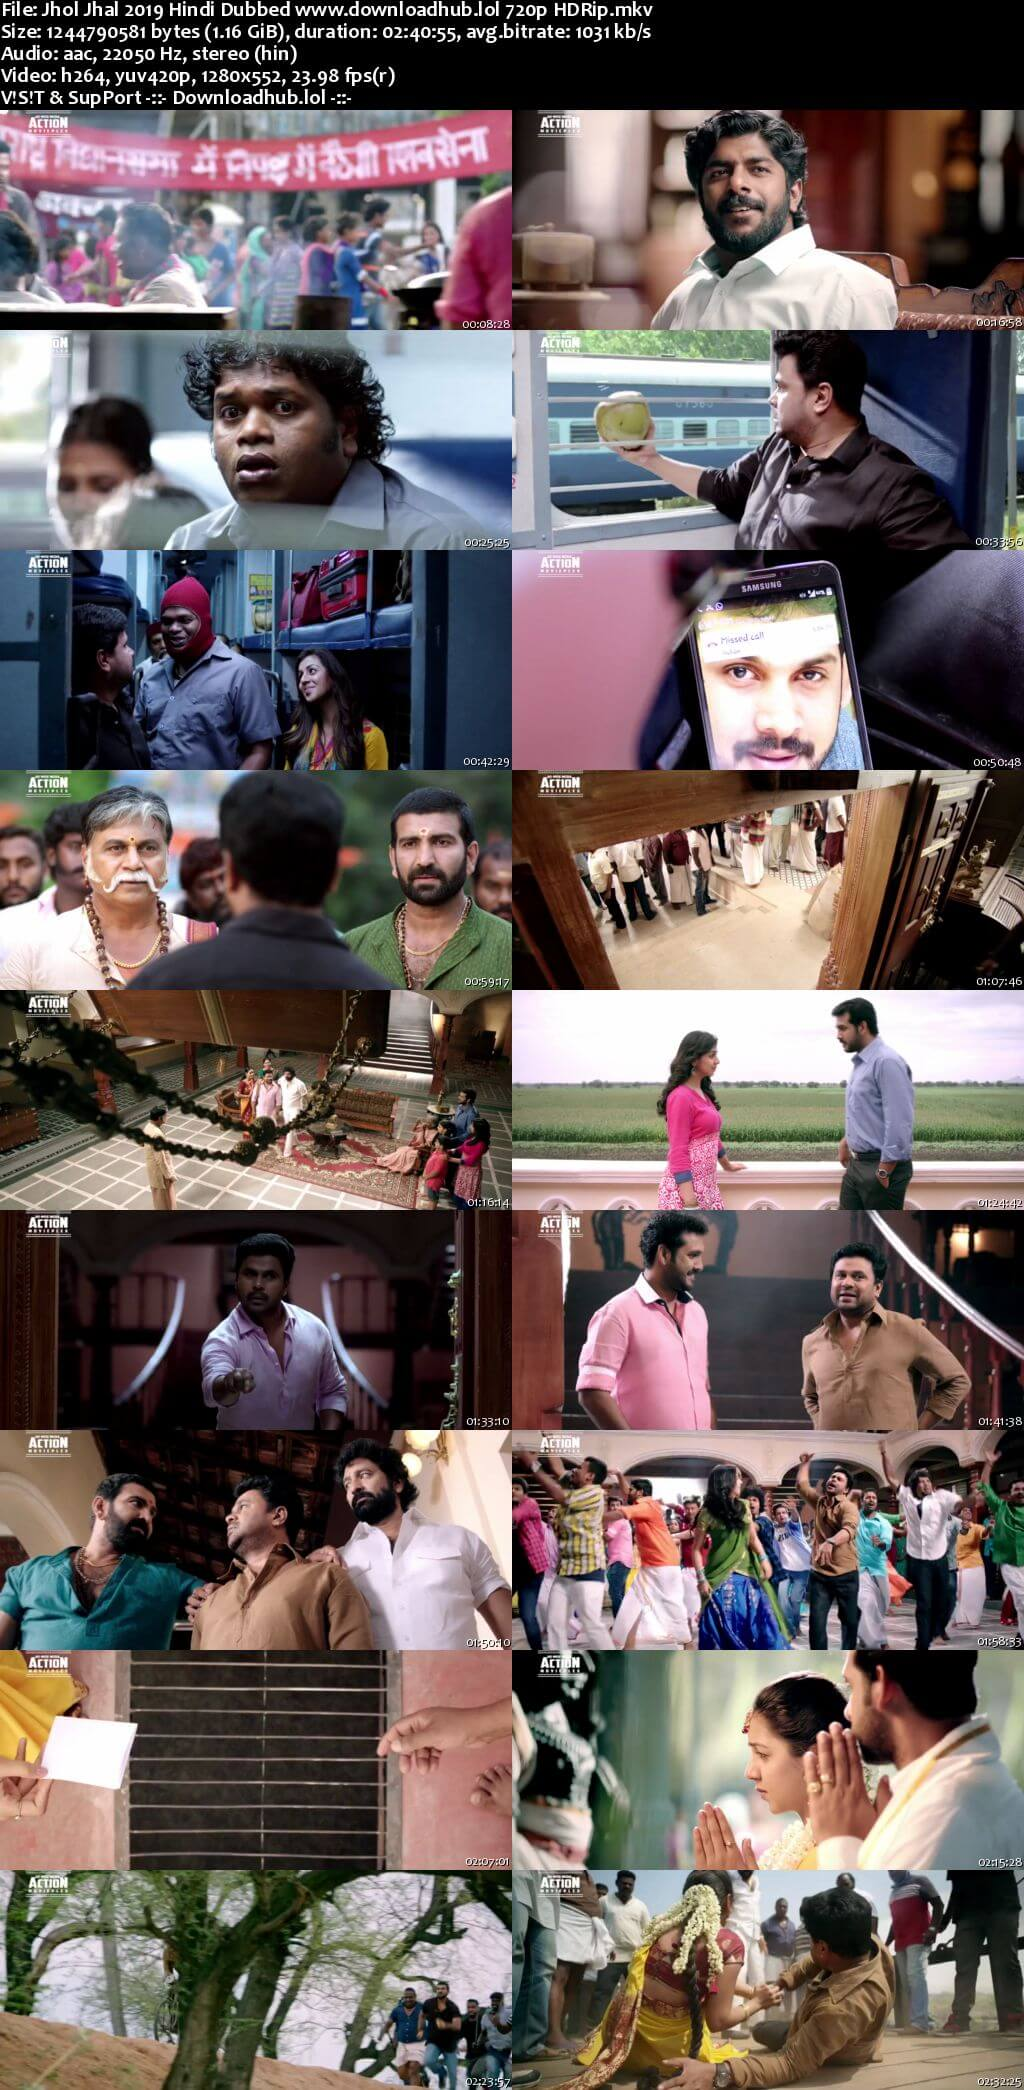 Jhol Jhal 2019 Hindi Dubbed 720p HDRip x264